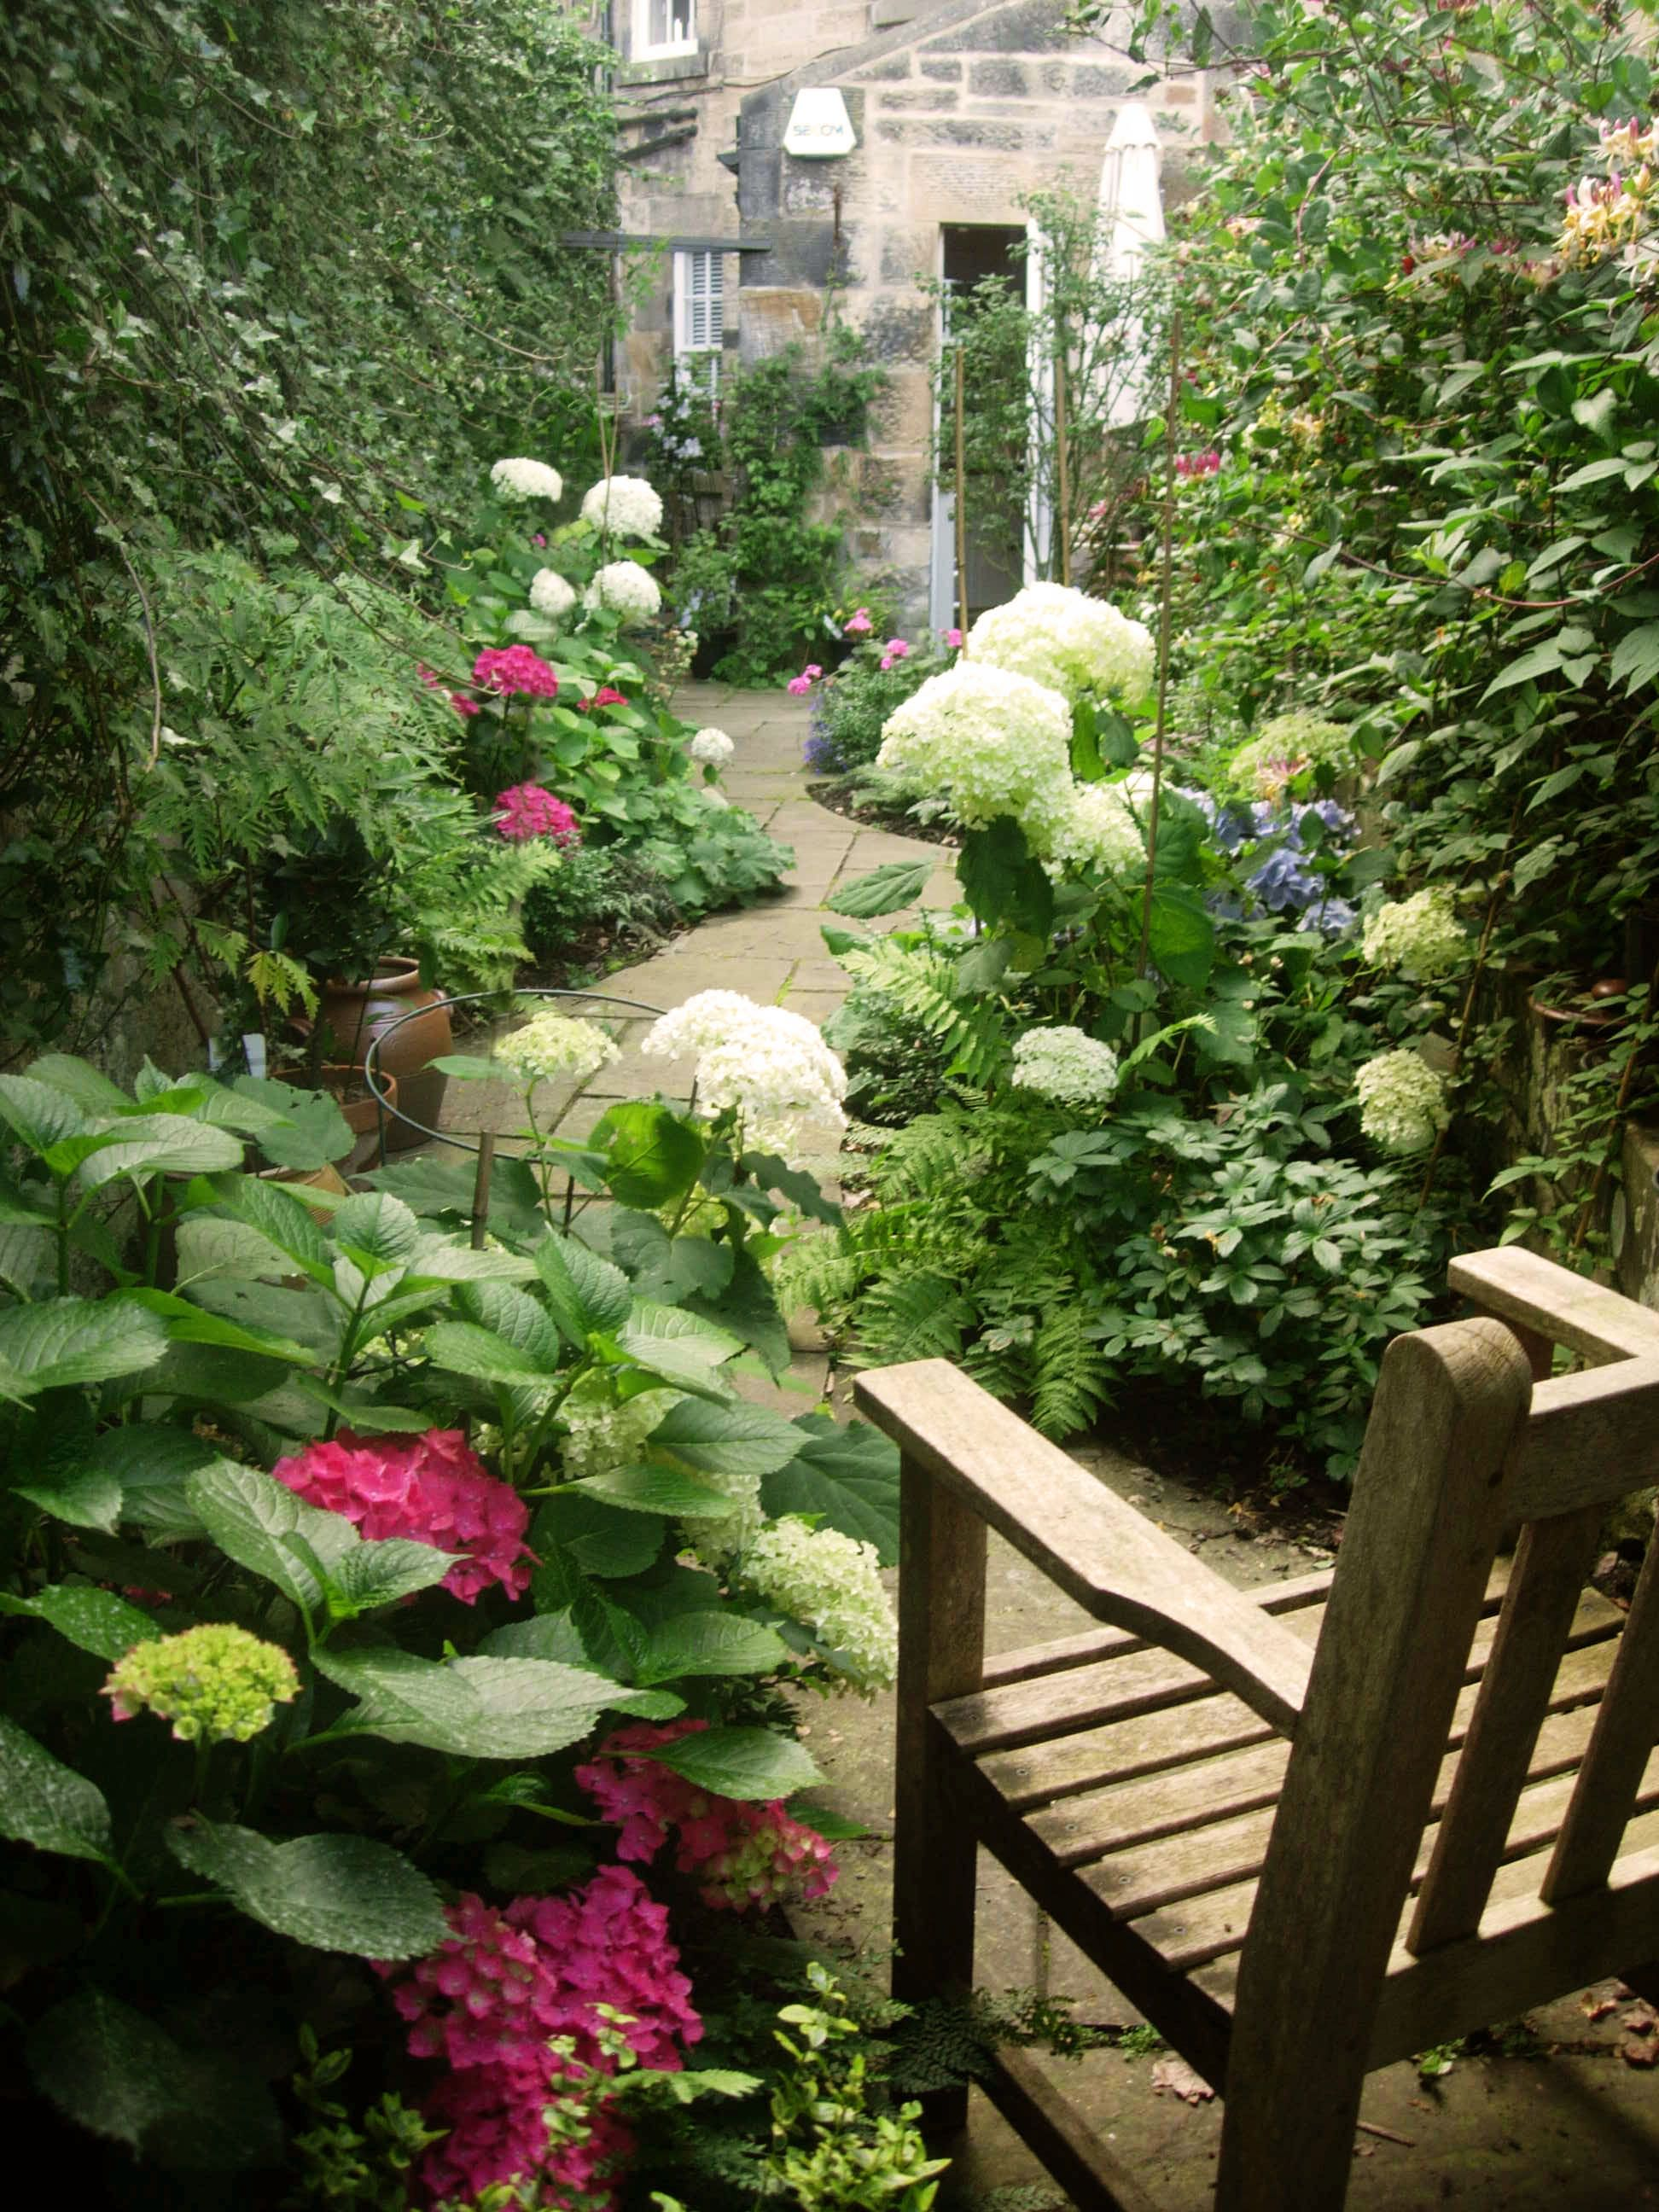 Motif Garden Design Edinburgh West End Linear Garden Garden Design Garden Design